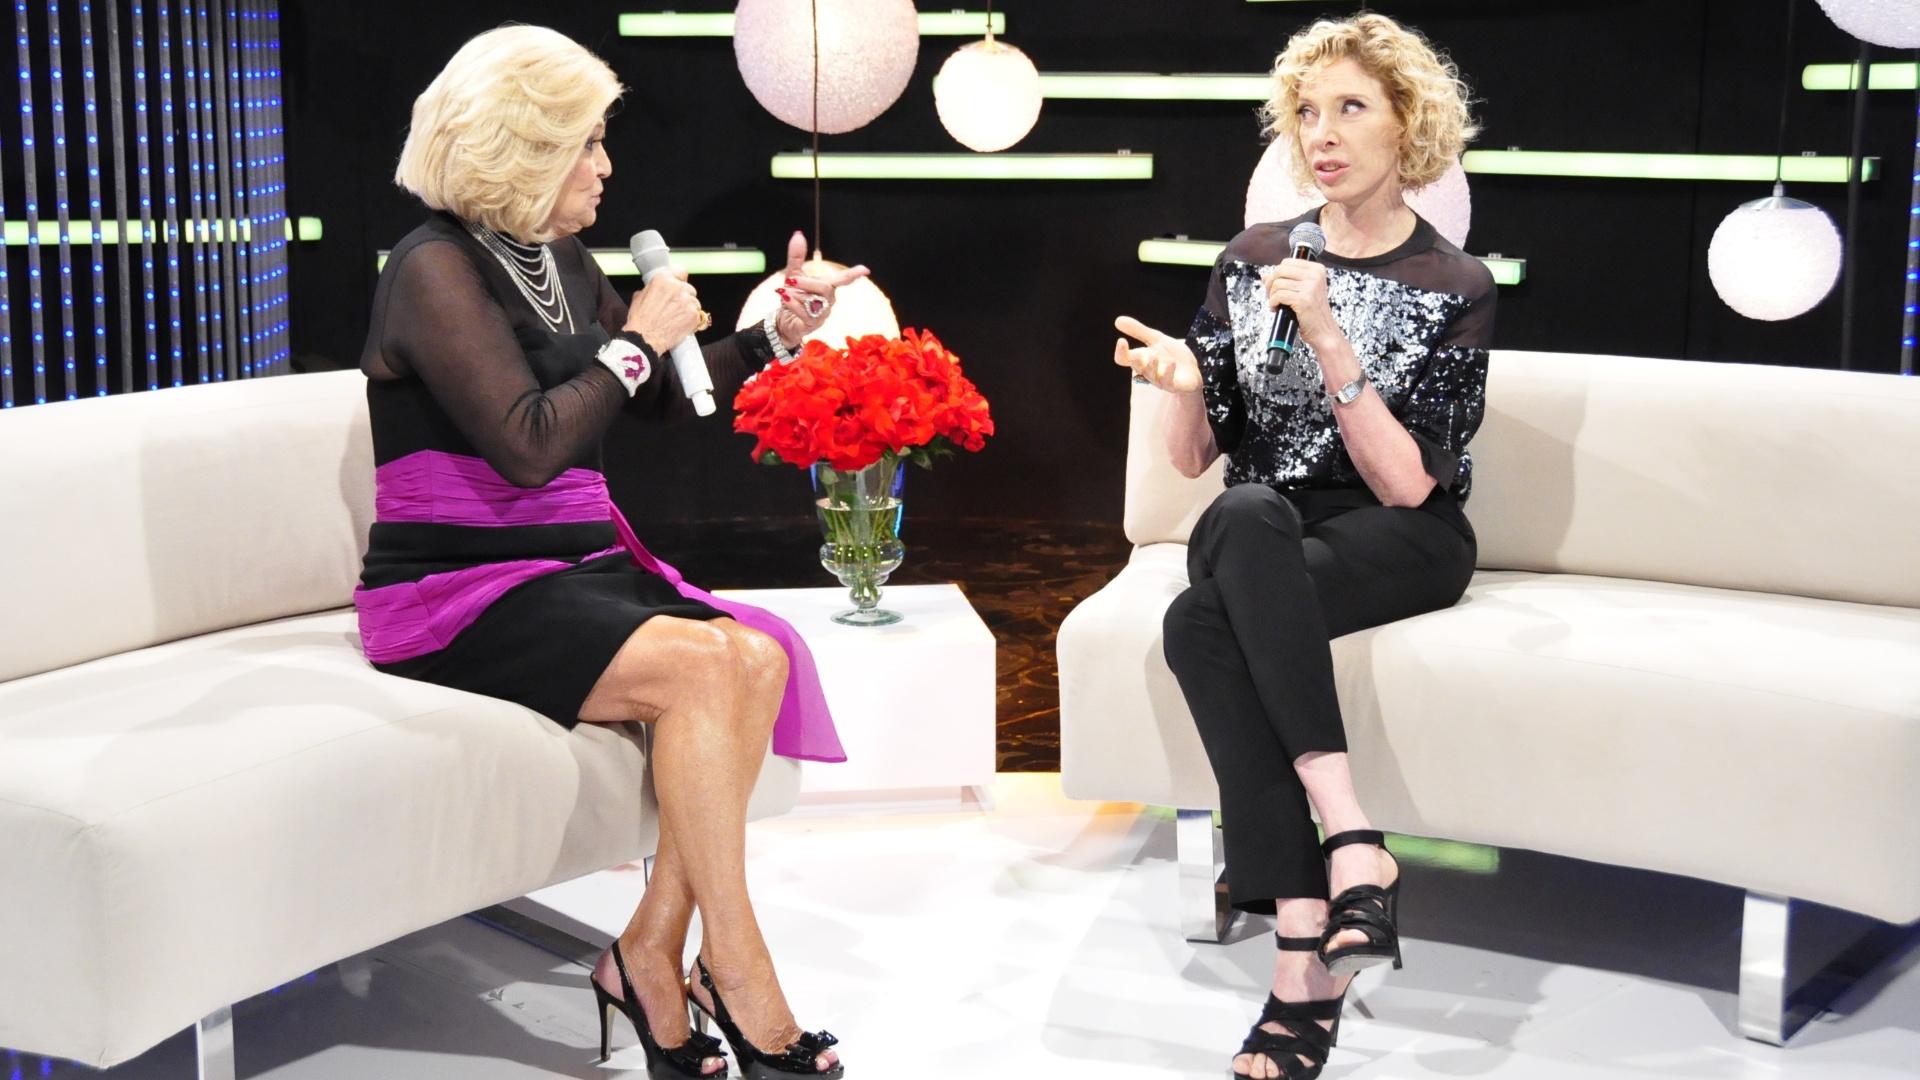 Hebe entrevista Marília Gabriela (11/11/11)